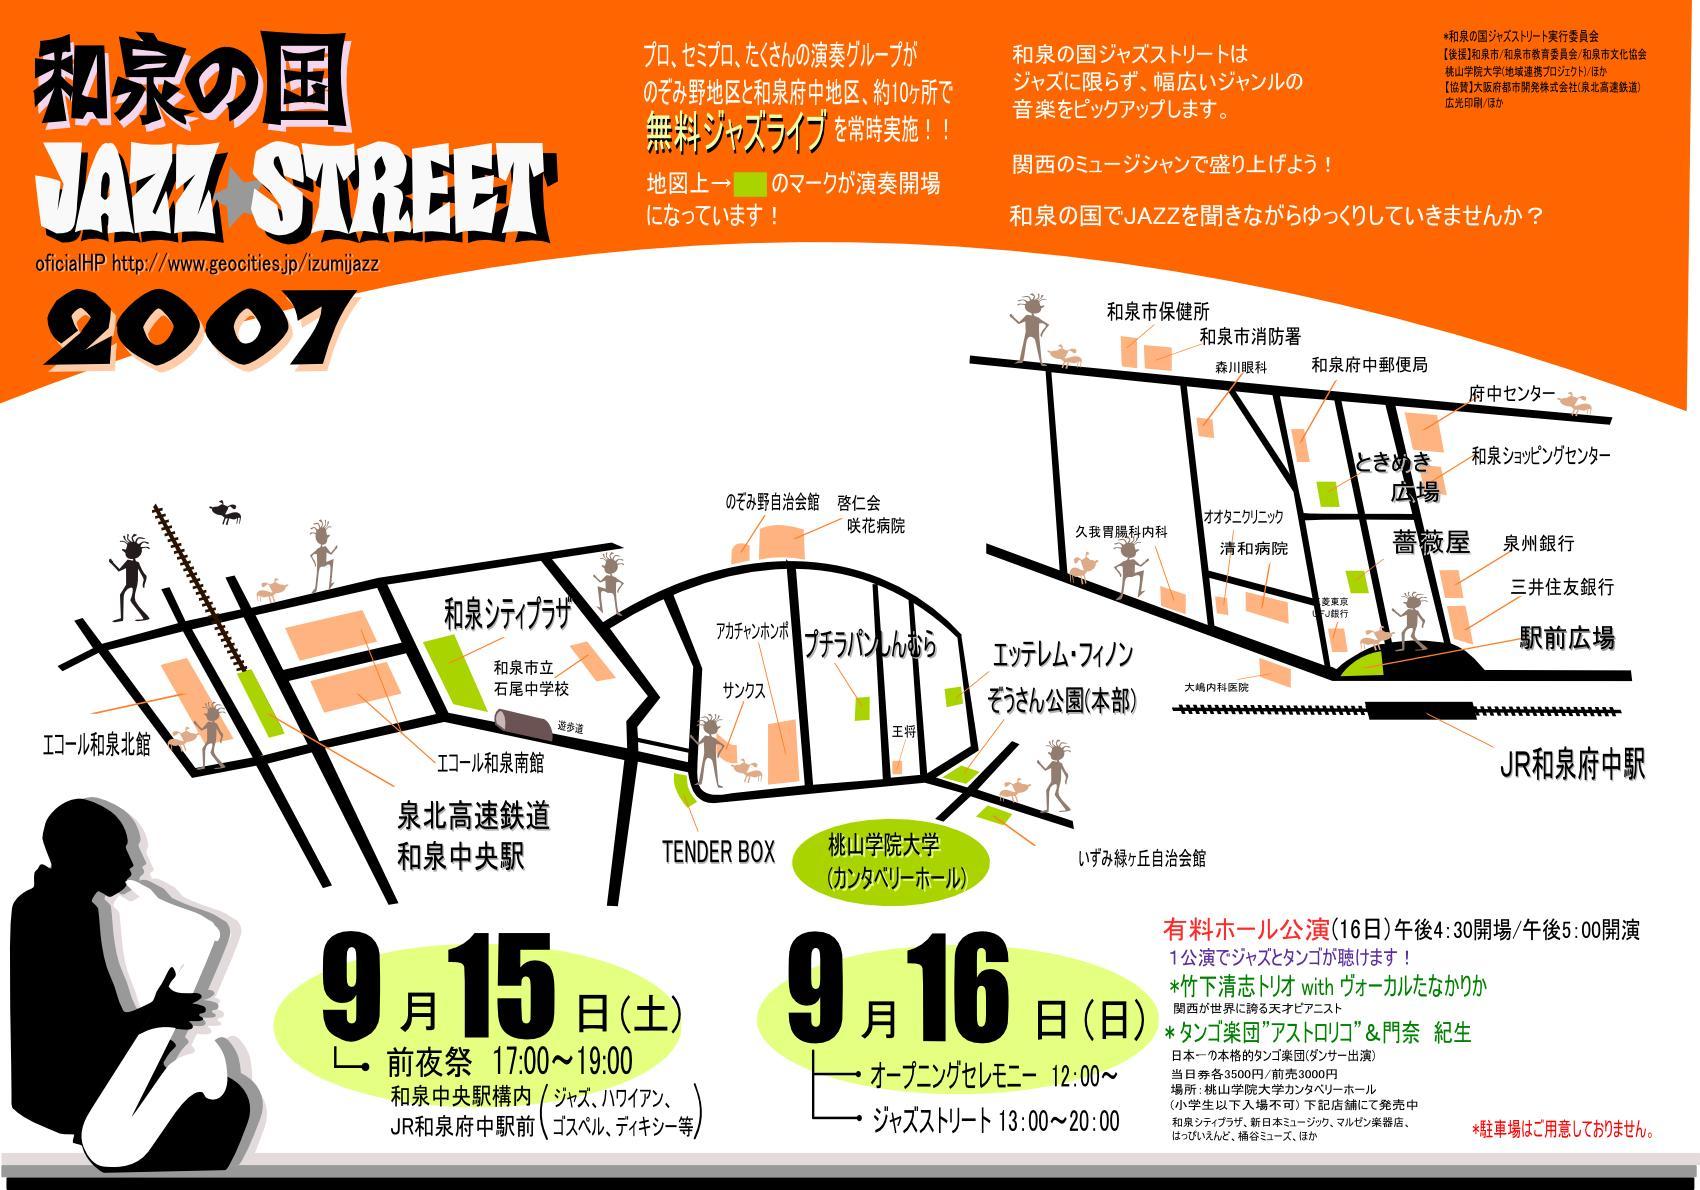 9/17[sun] 和泉の国JAZZ STREET 詳細_f0042307_1349204.jpg